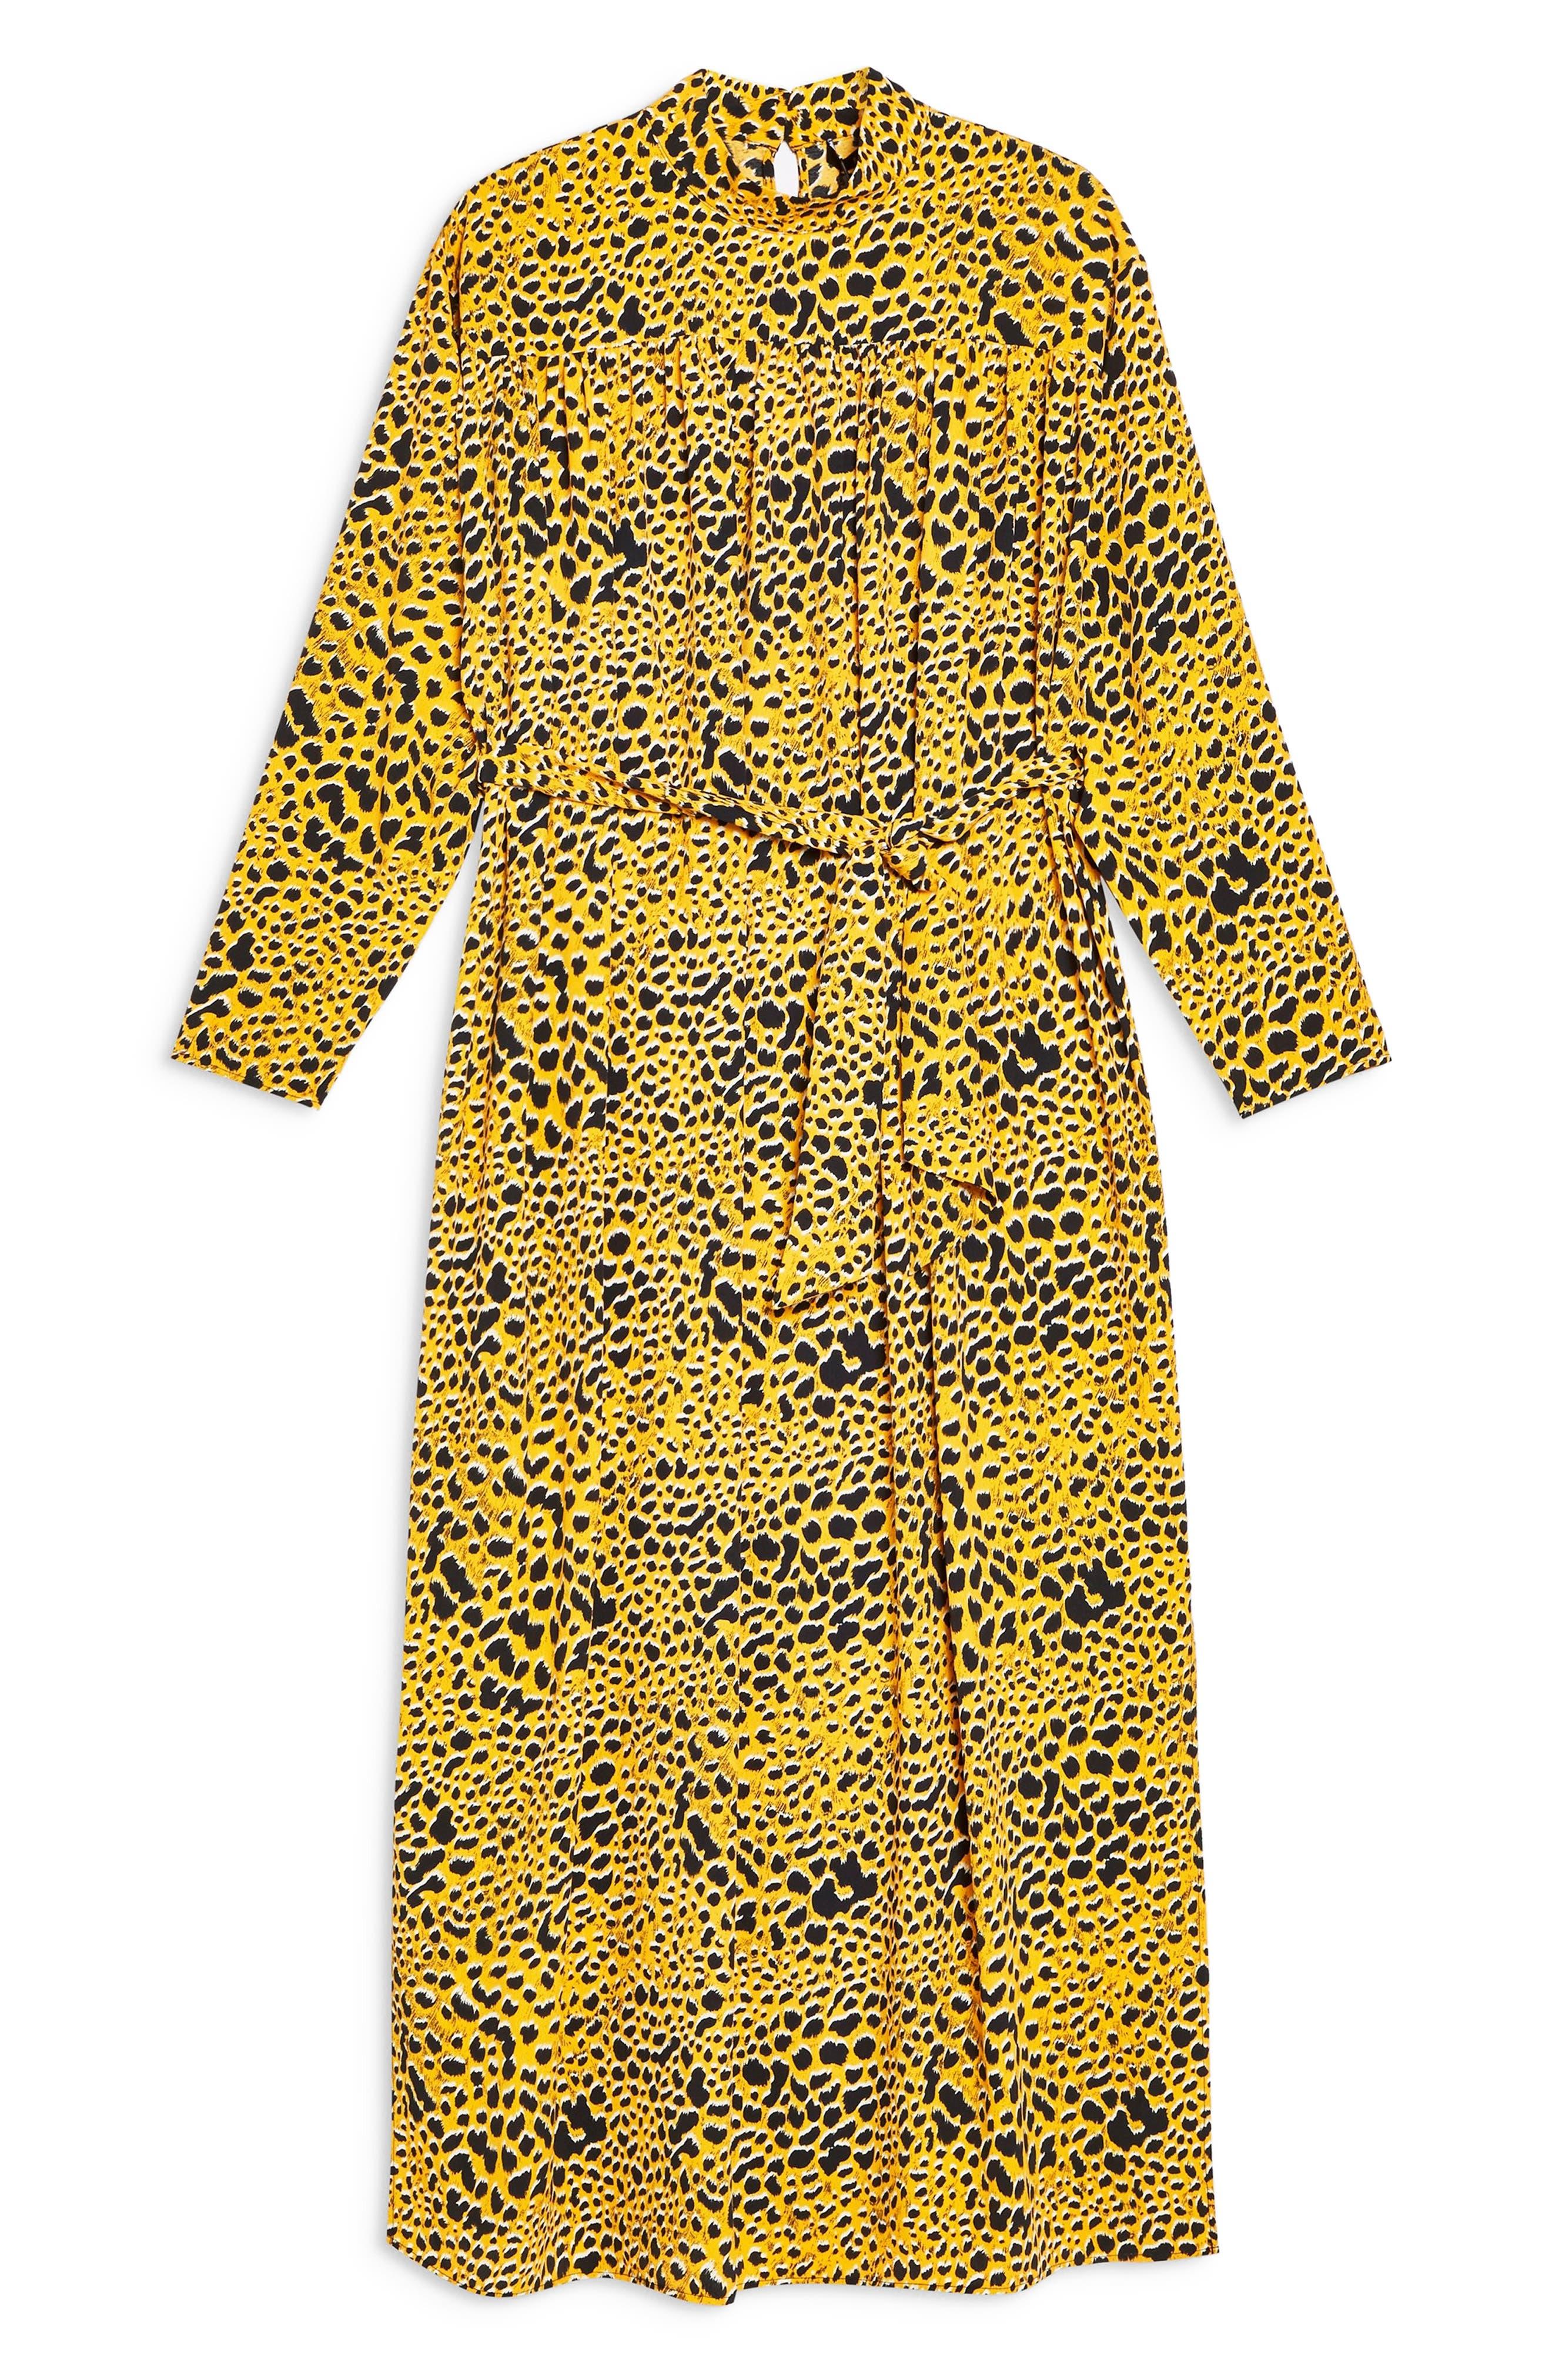 TOPSHOP,                             Abstract Animal Print Midi Dress,                             Alternate thumbnail 4, color,                             YELLOW MULTI